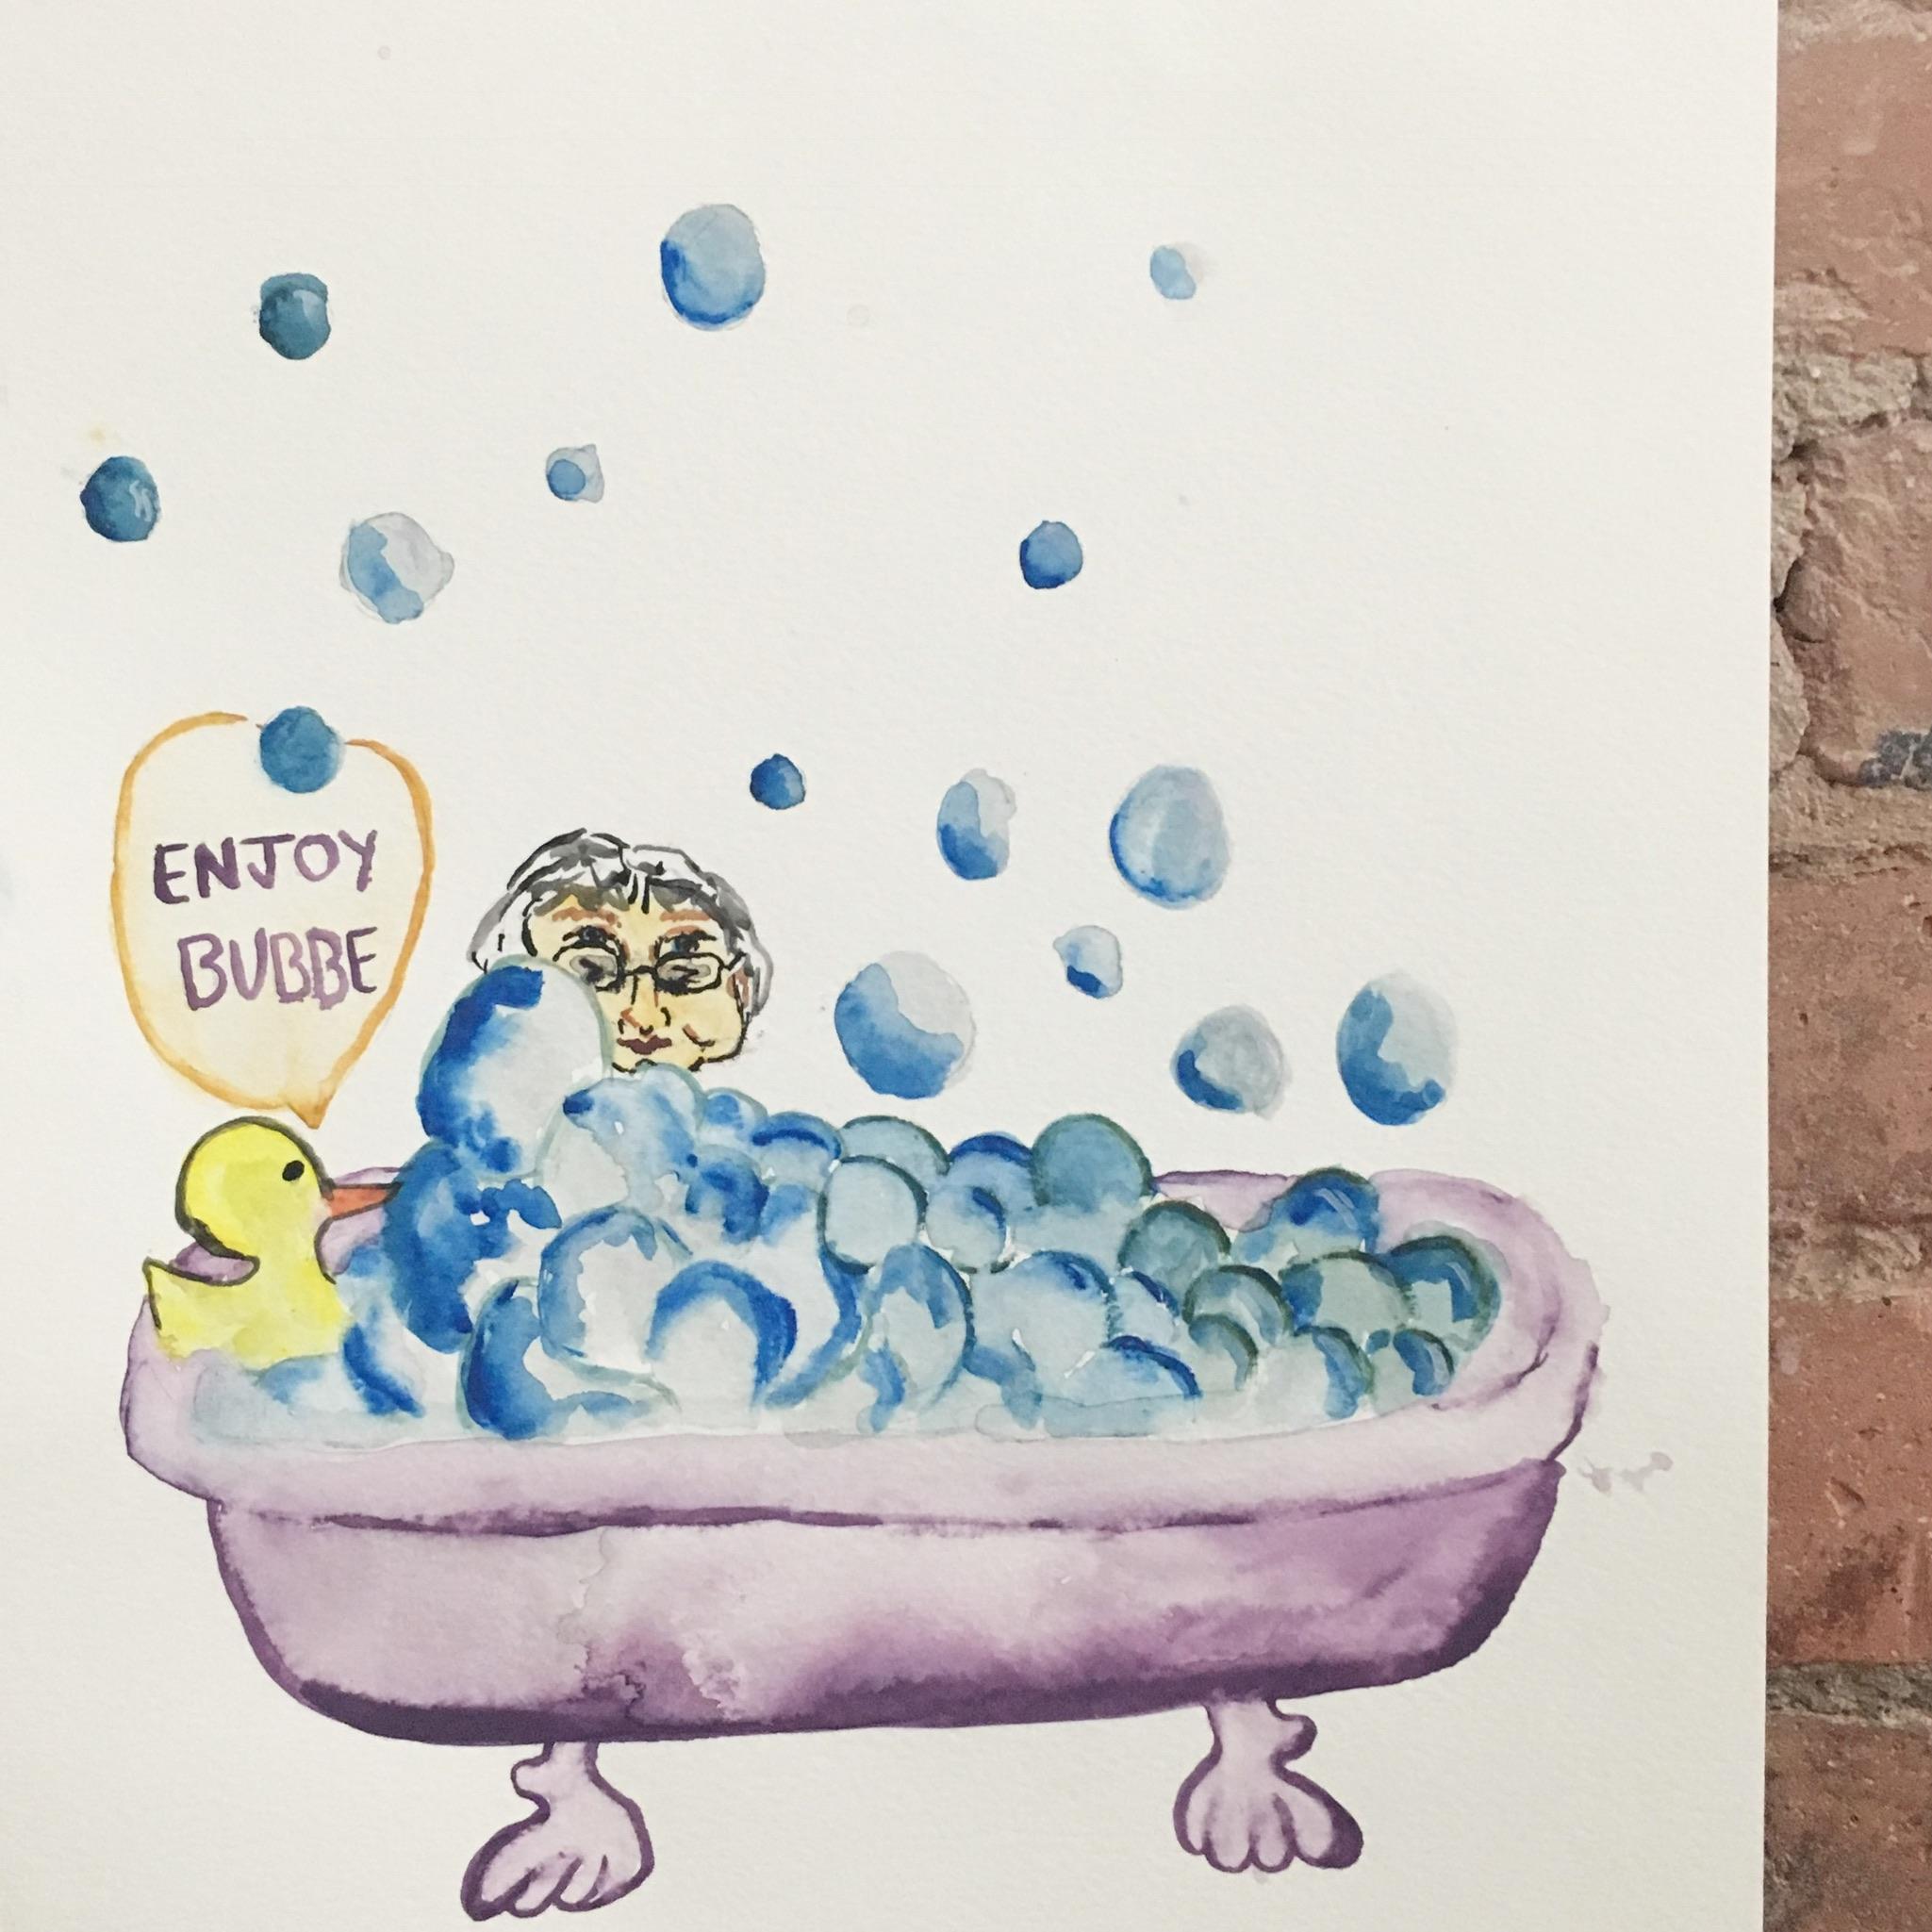 enjoy-bubbe.JPG